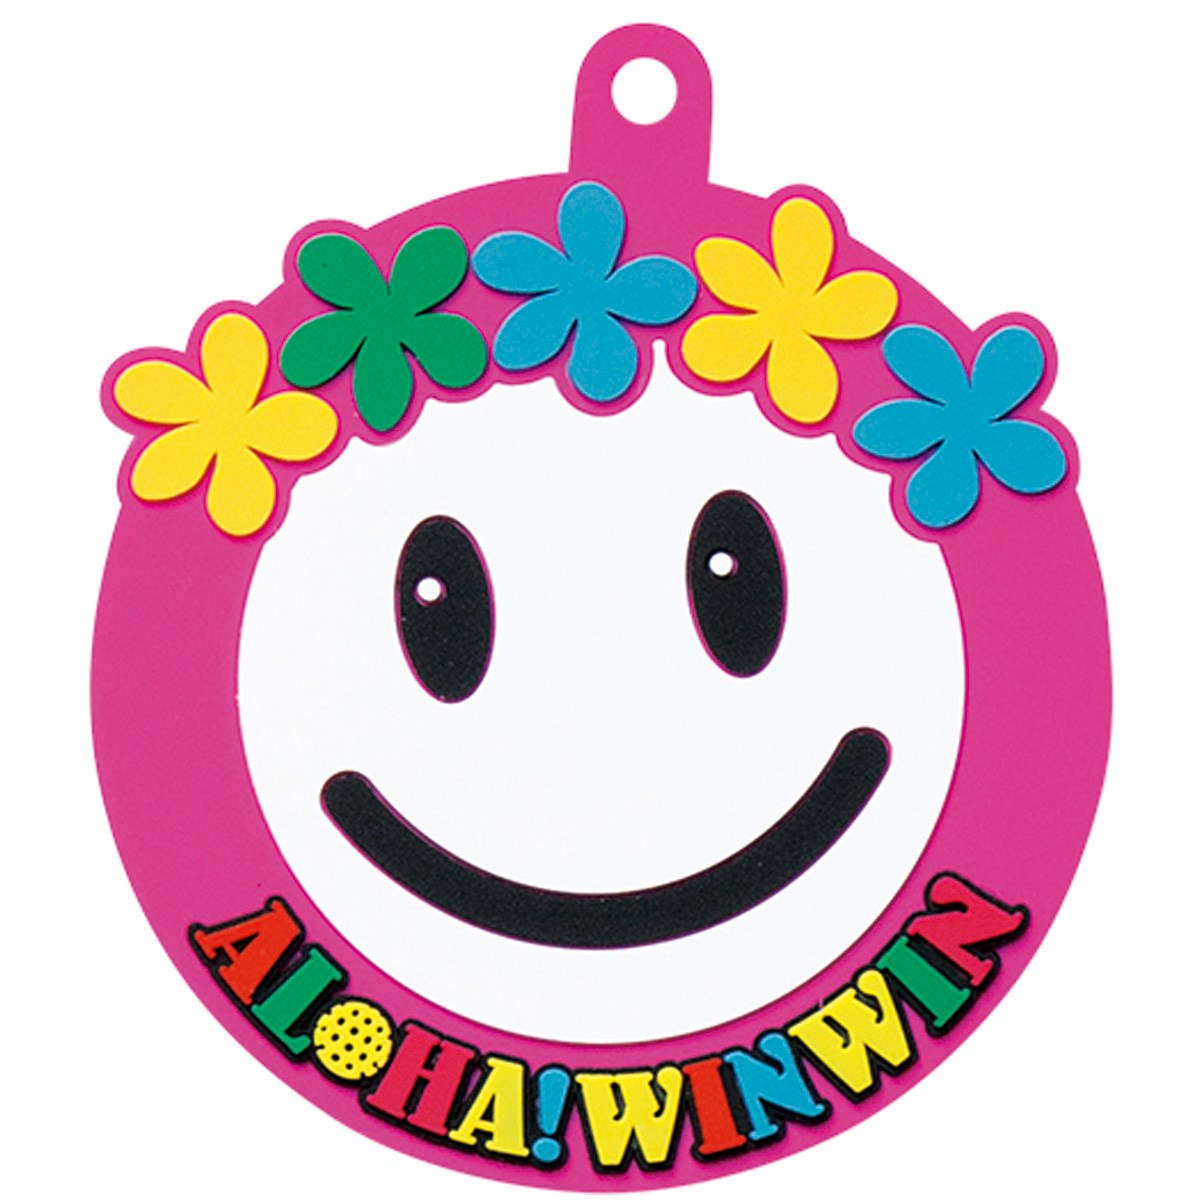 WINWIN STYLE ウィンウィンスタイル ALOHA SMILEパターキャッチャー ピンク